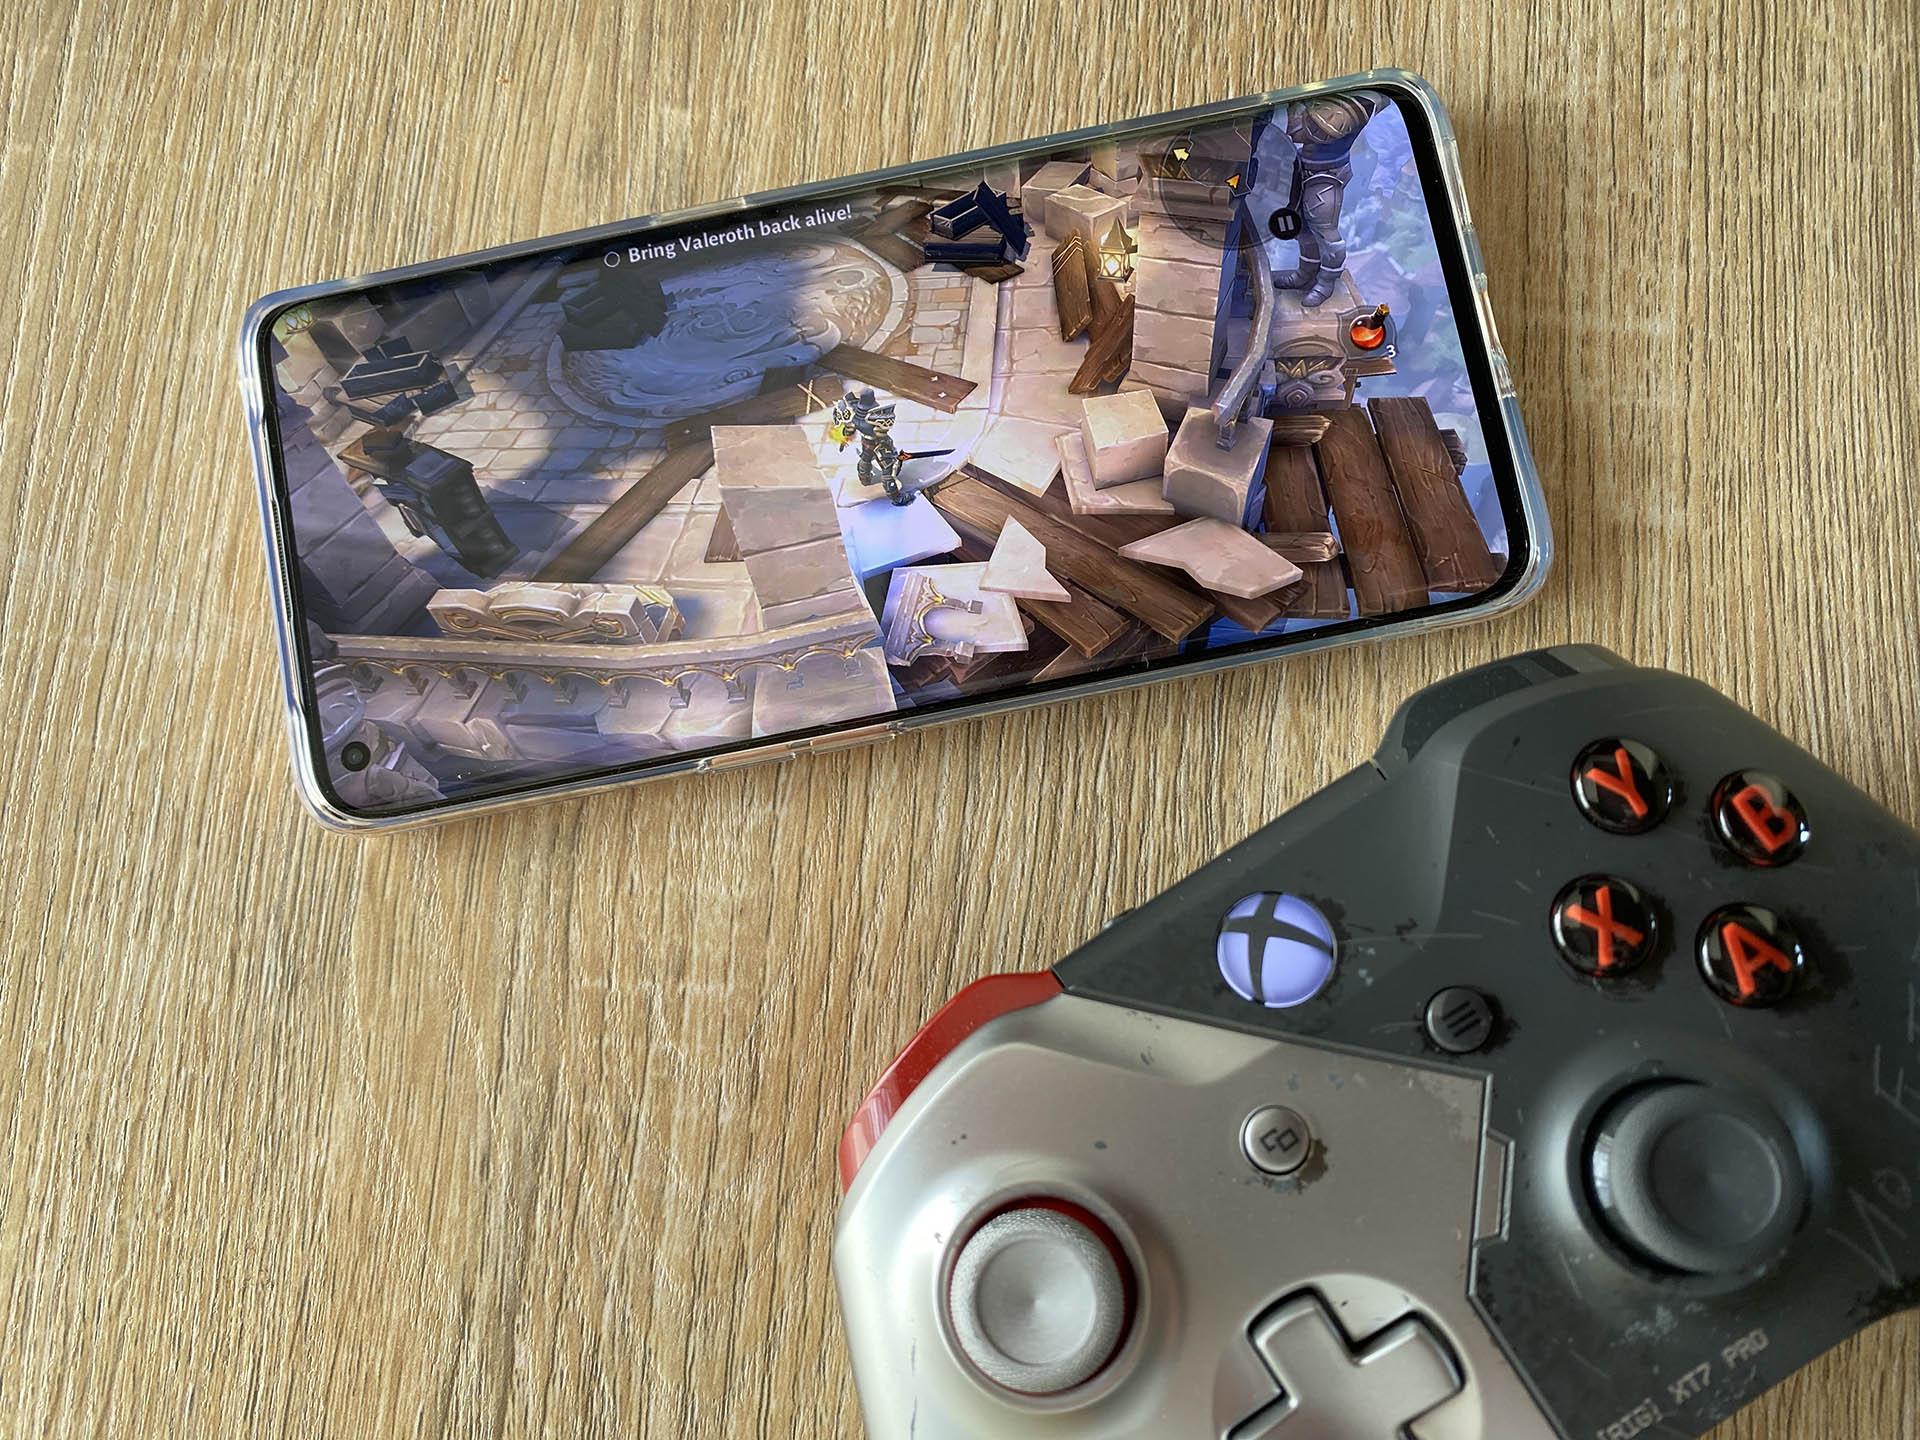 OPPO Find X2 Pro 5G - Vegan Orange Leather Edition